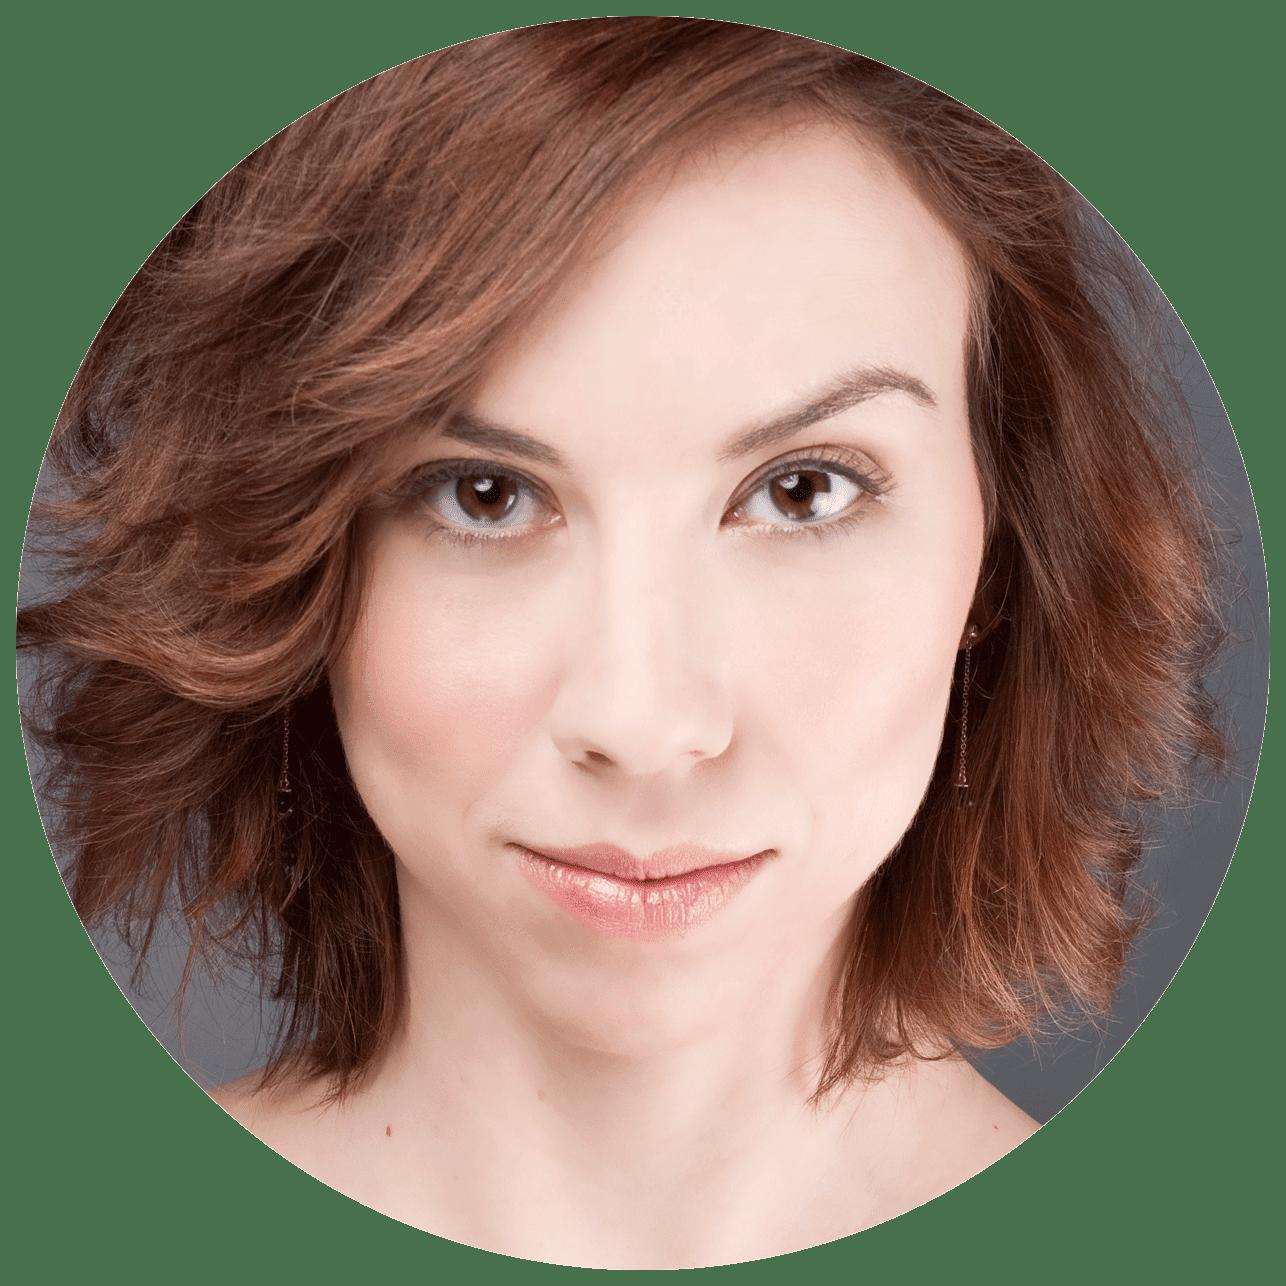 Amanda-McCormick-Headshot